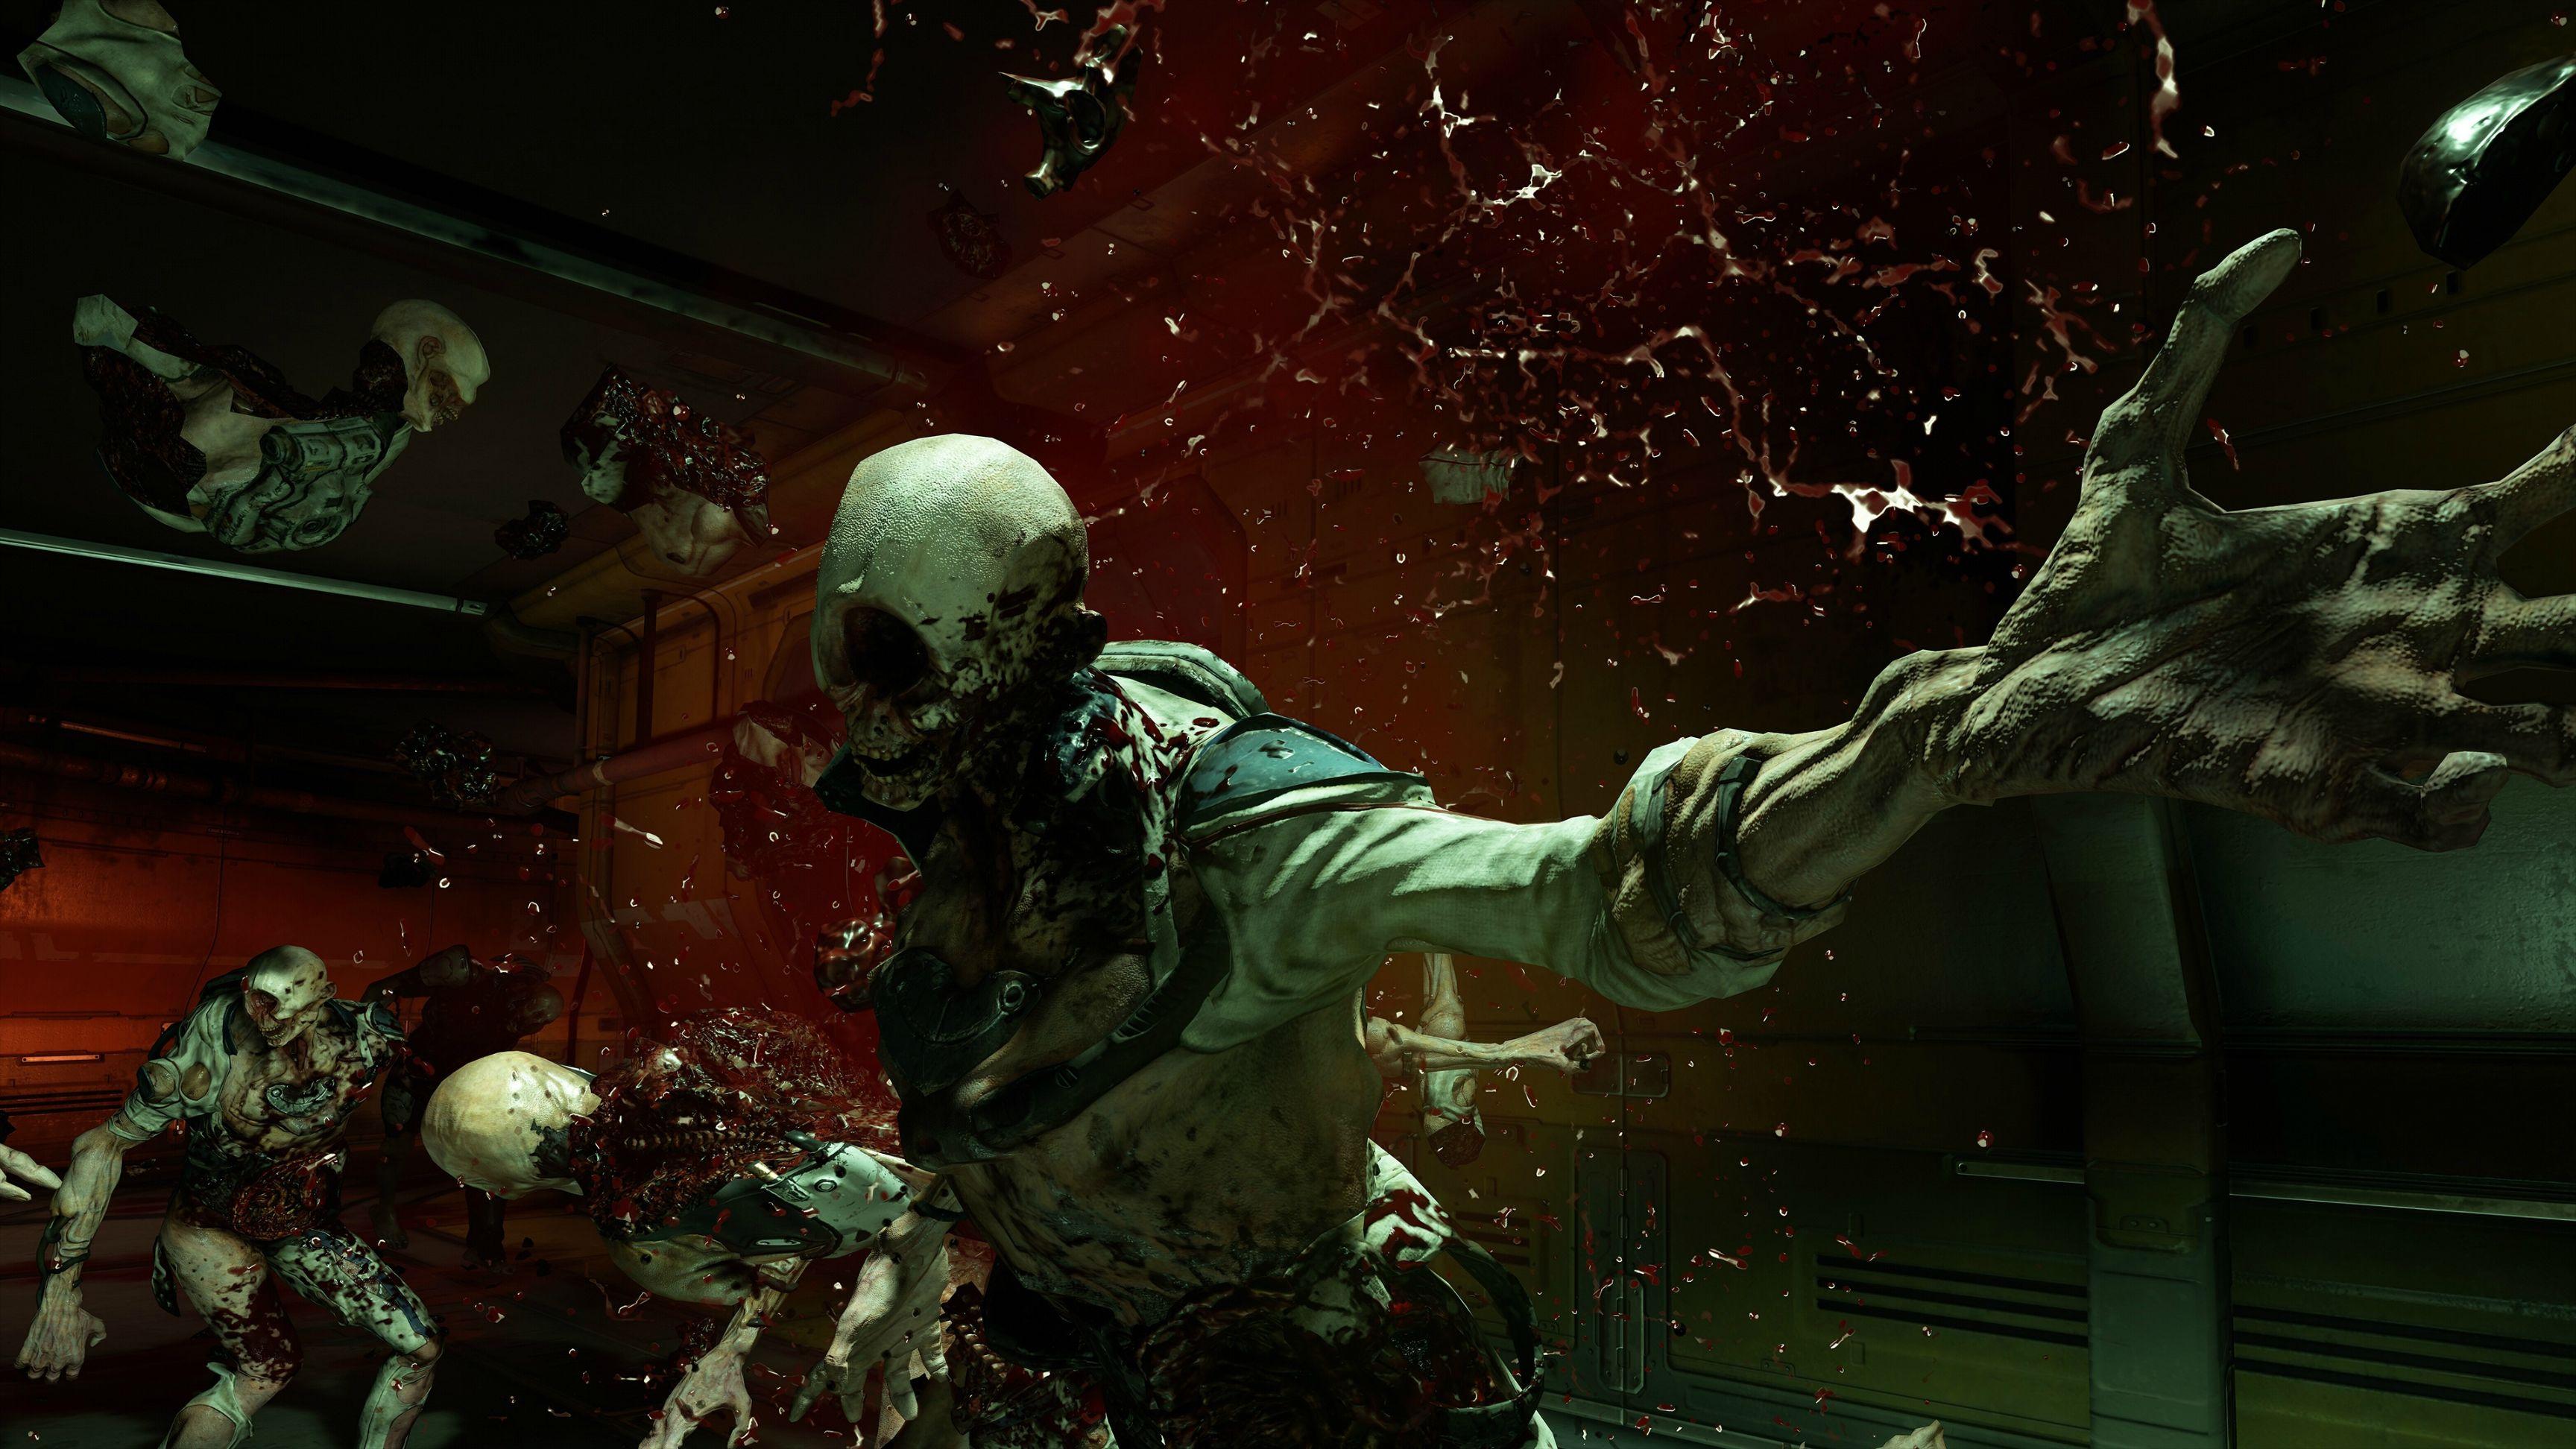 2016 Doom 4, Hd Games, 4k Wallpapers, Images, Backgrounds